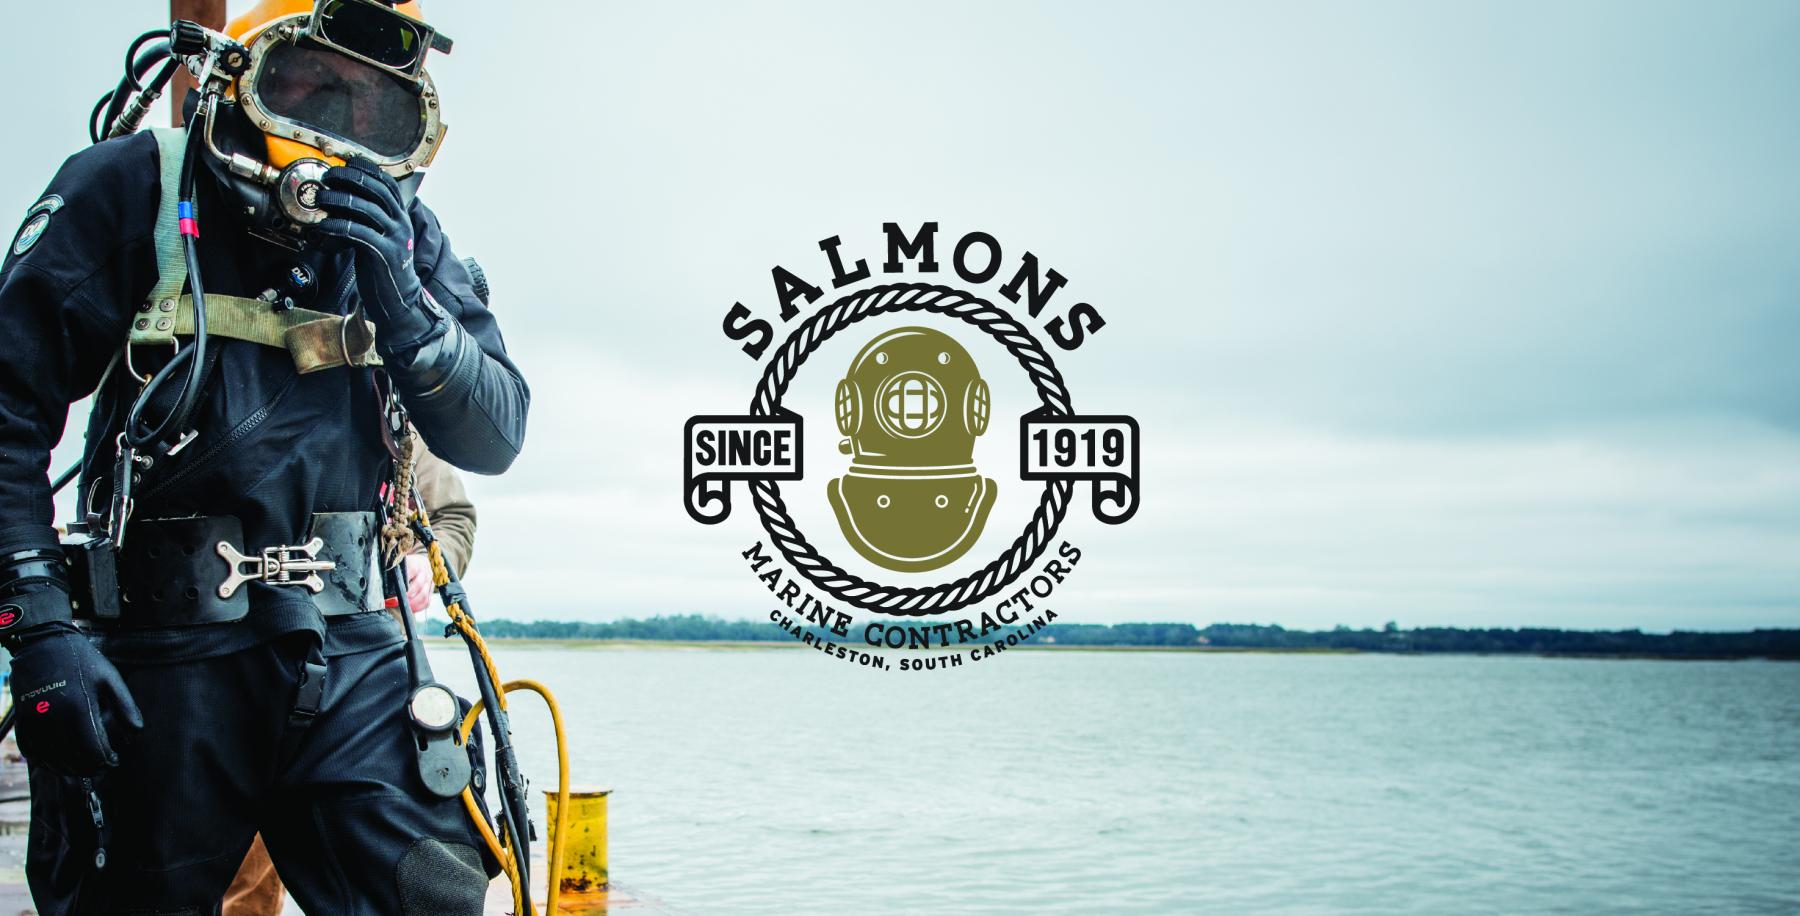 Salmons Marine